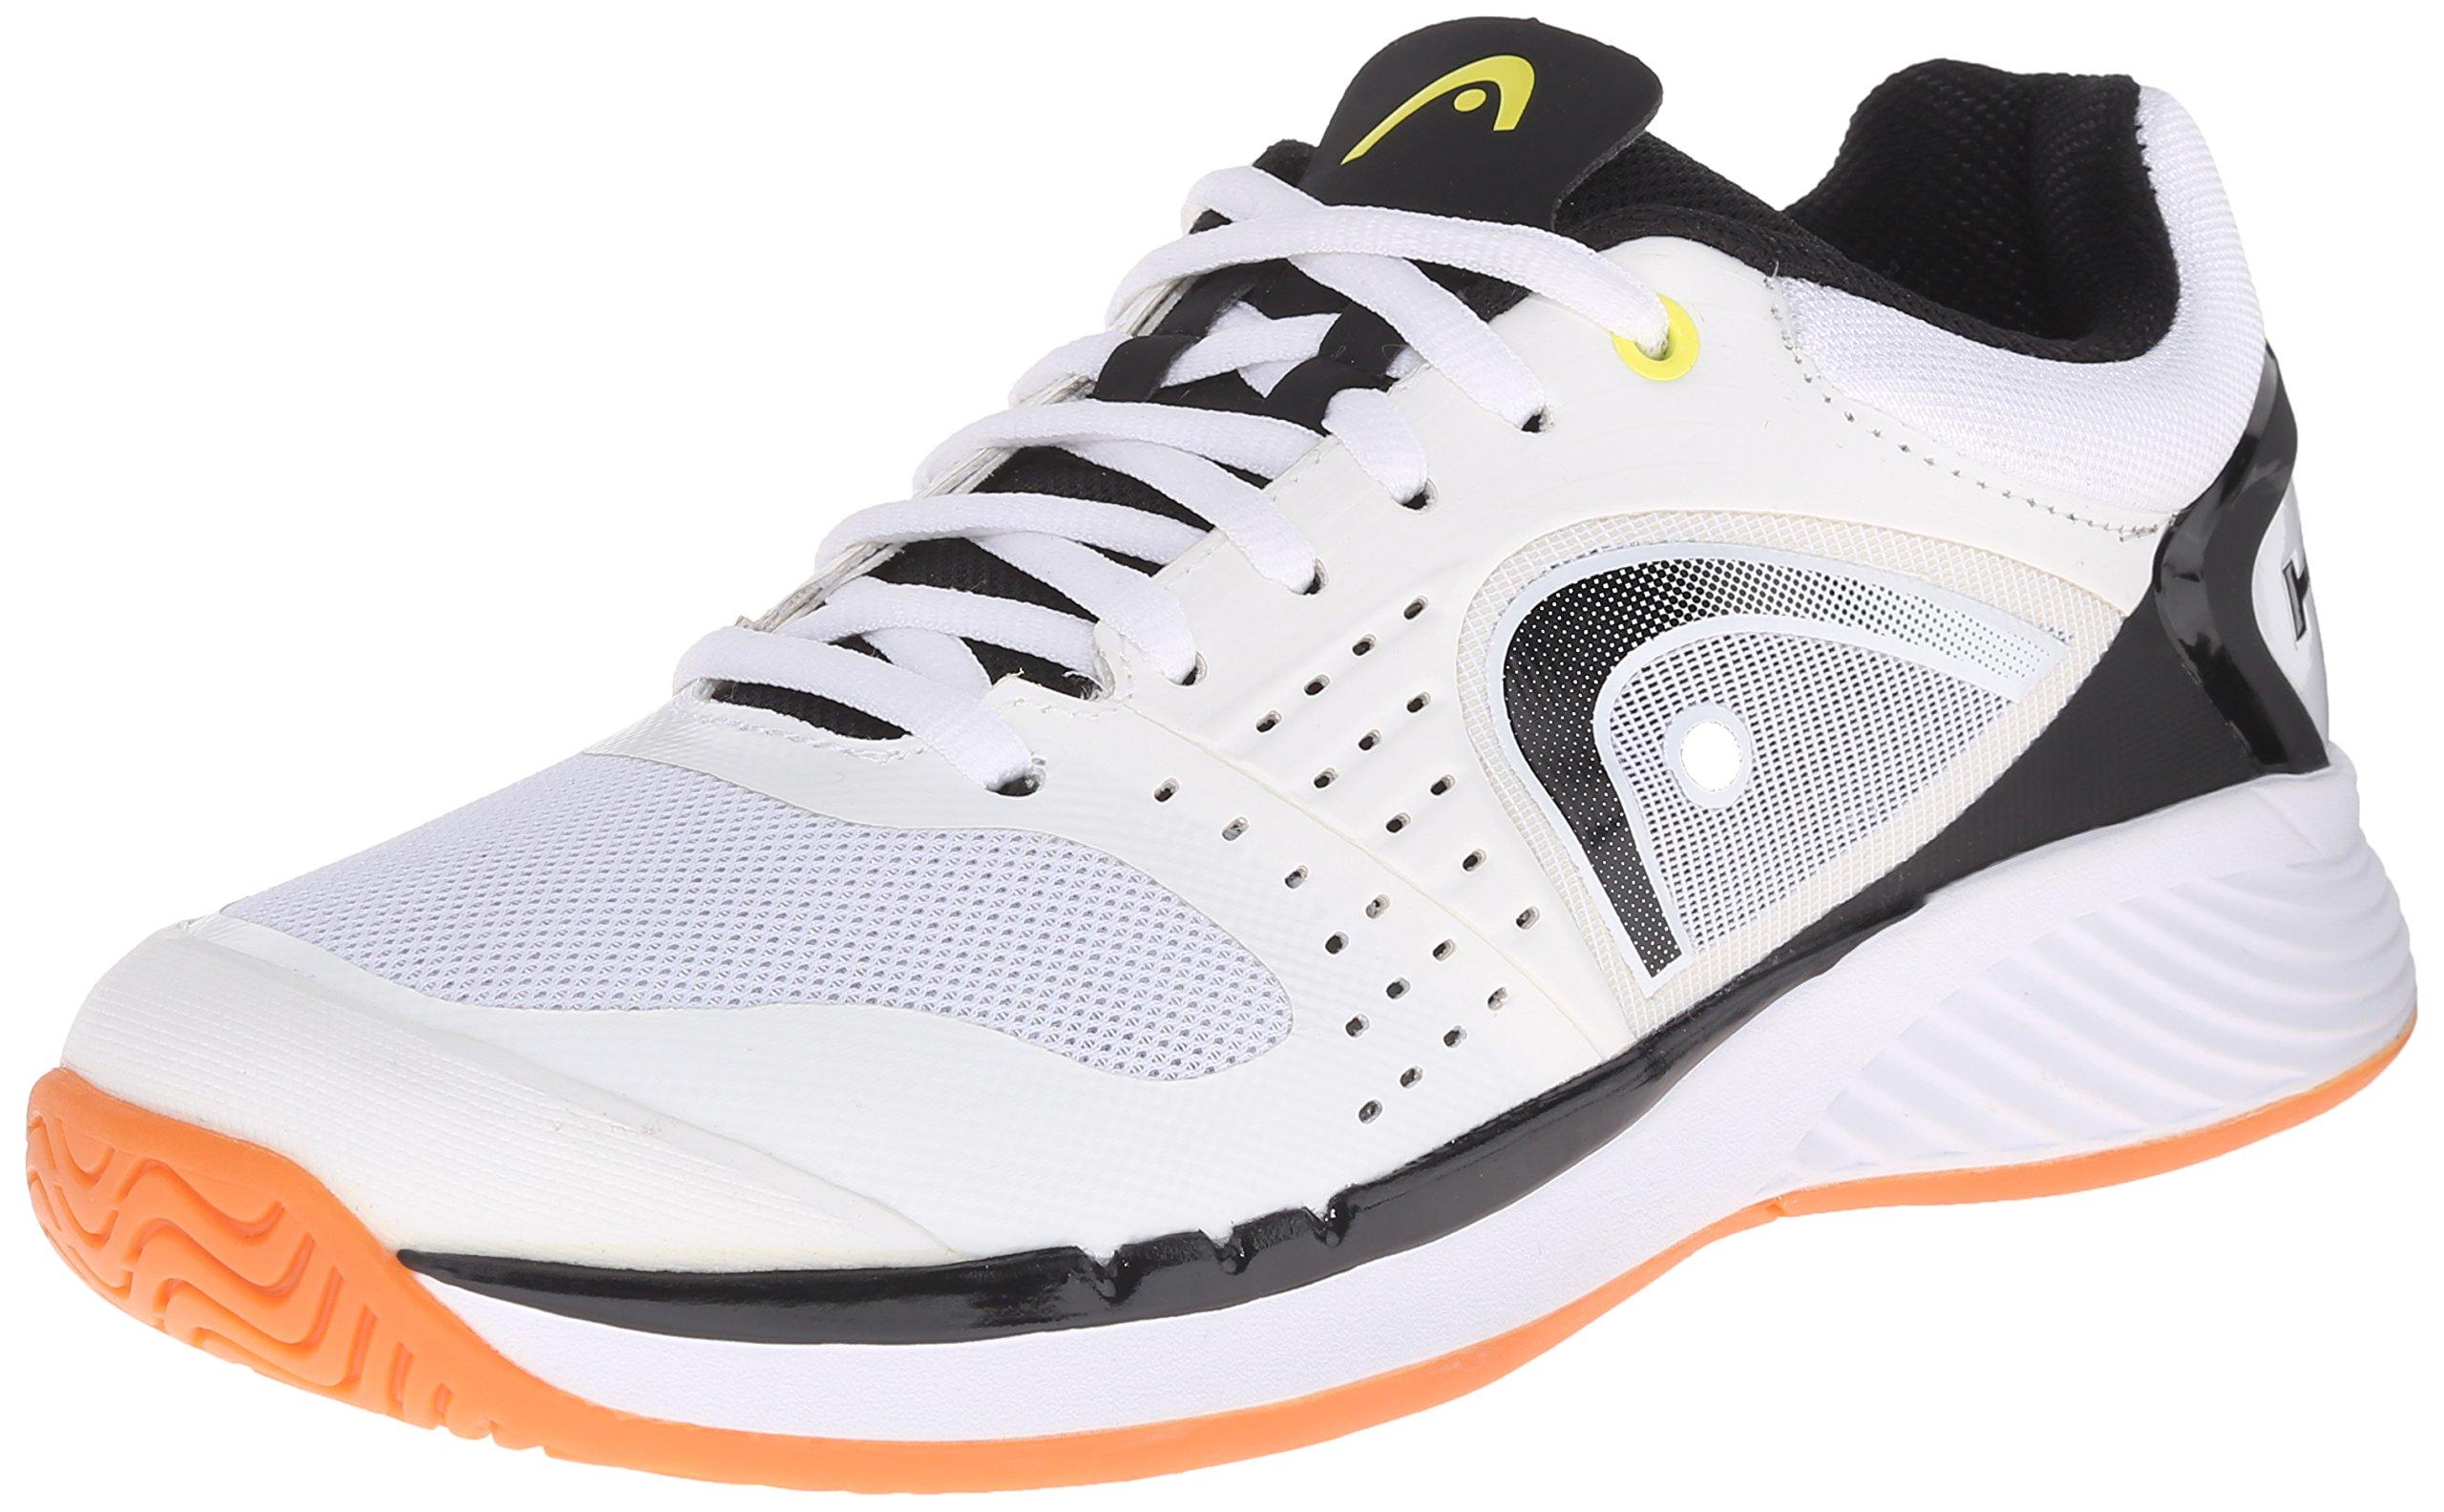 Head Men's Sprint Pro Indoor Low Shoe, White/Black, 7.5 M US